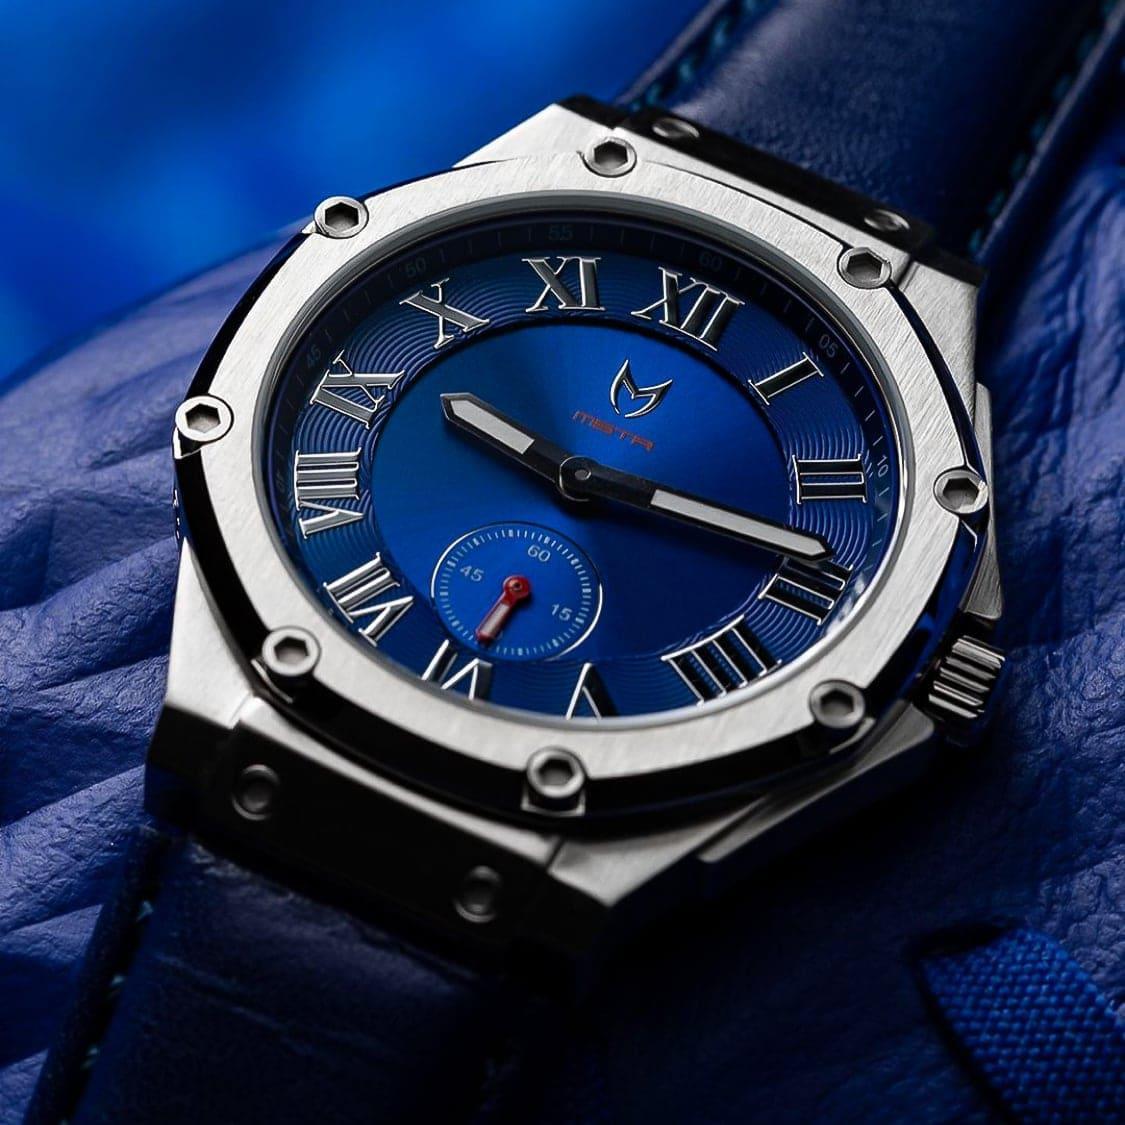 Silber & Blau- Leder